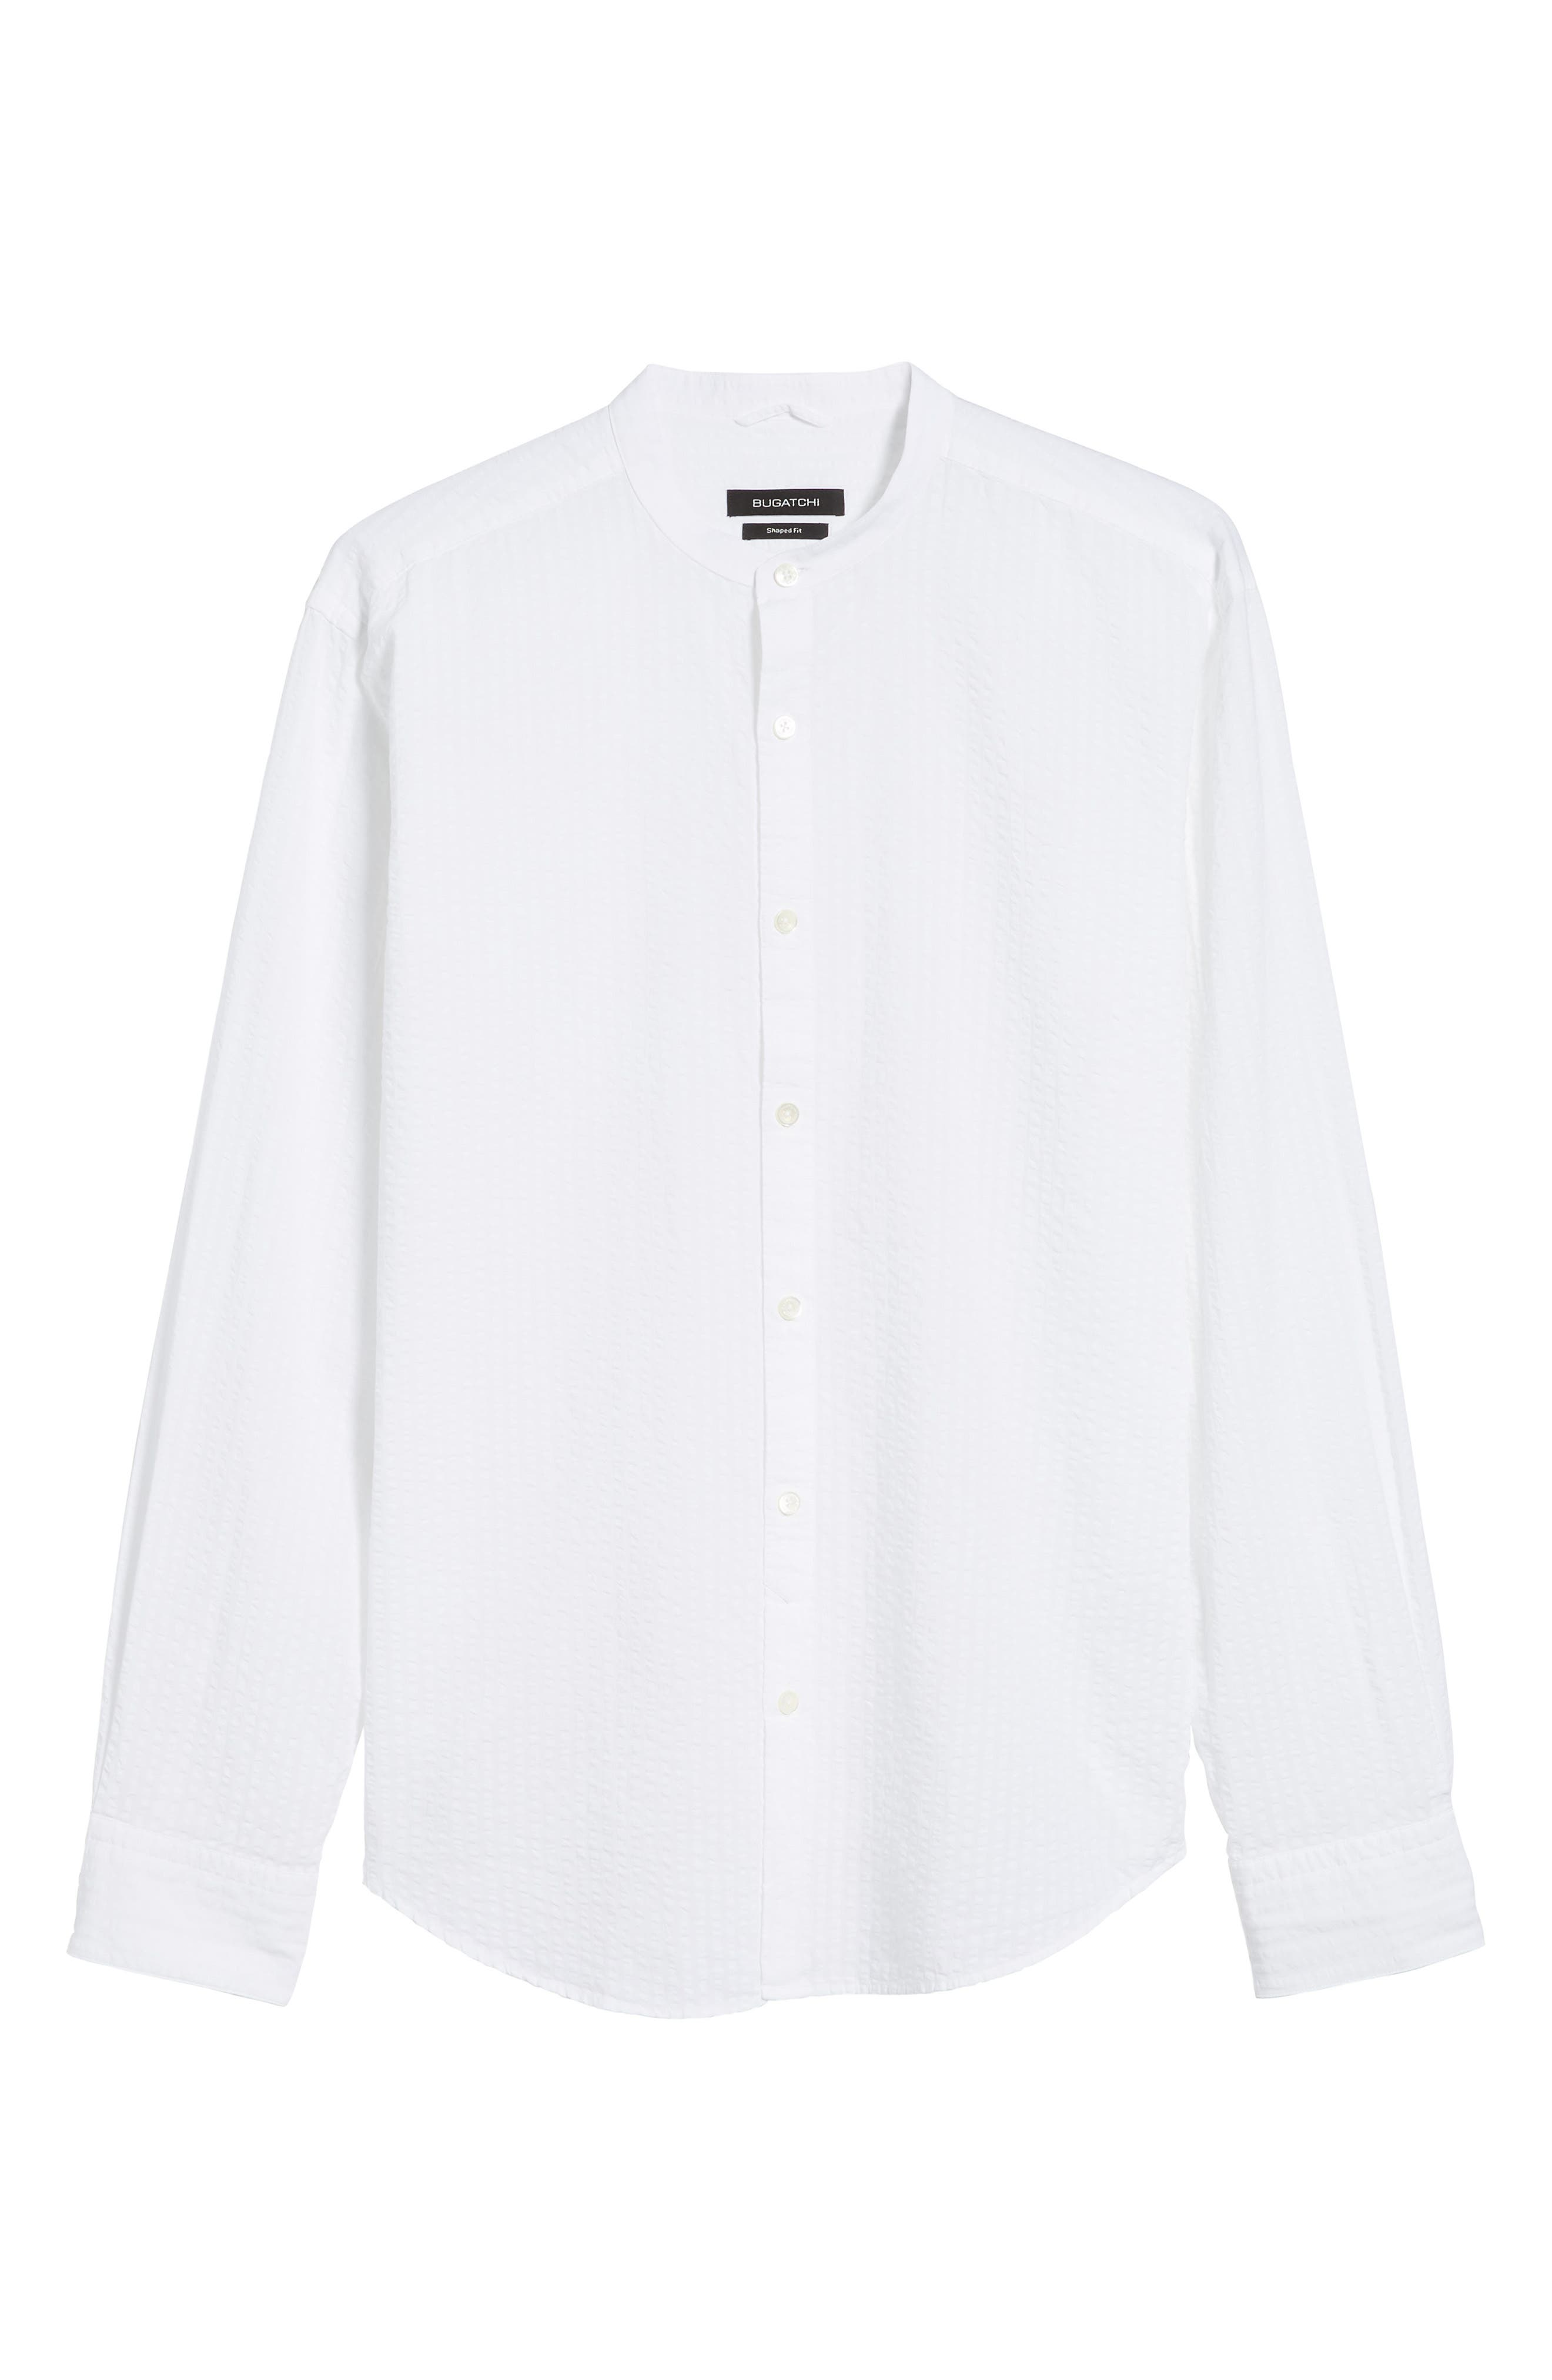 Shaped Fit Band Collar Seersucker Sport Shirt,                             Alternate thumbnail 6, color,                             White